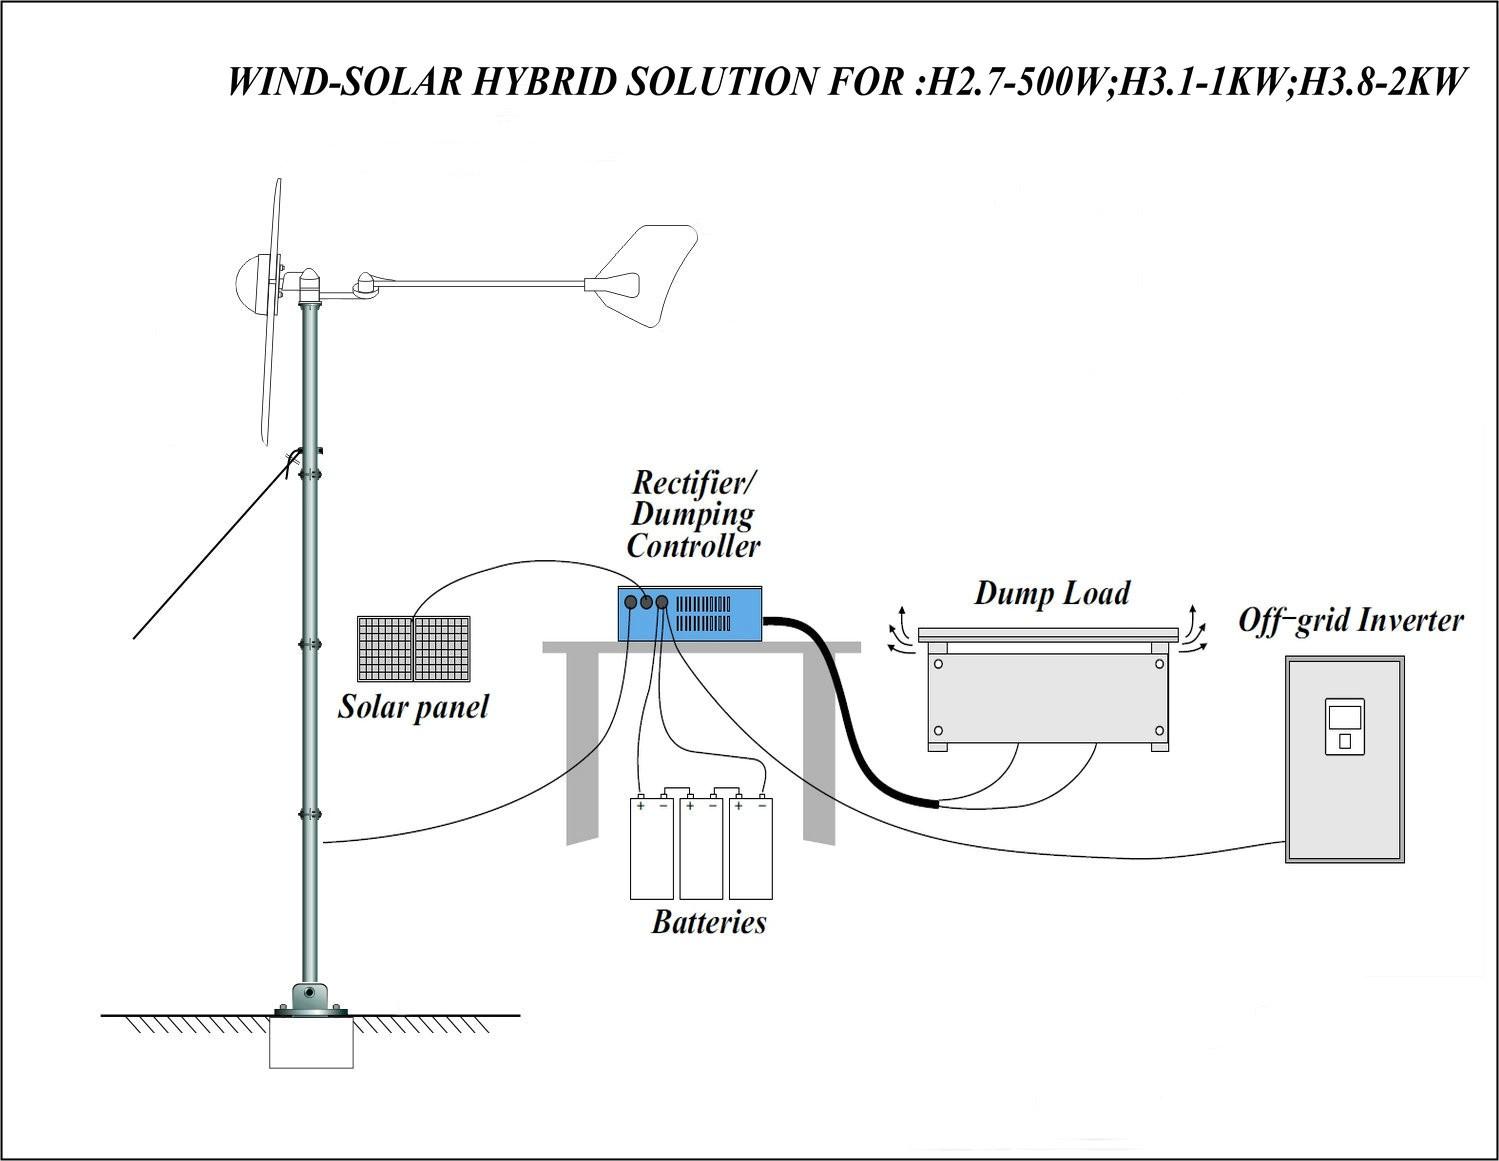 H2 7 500w Wind Solar Hybrid Wind Turbine From China